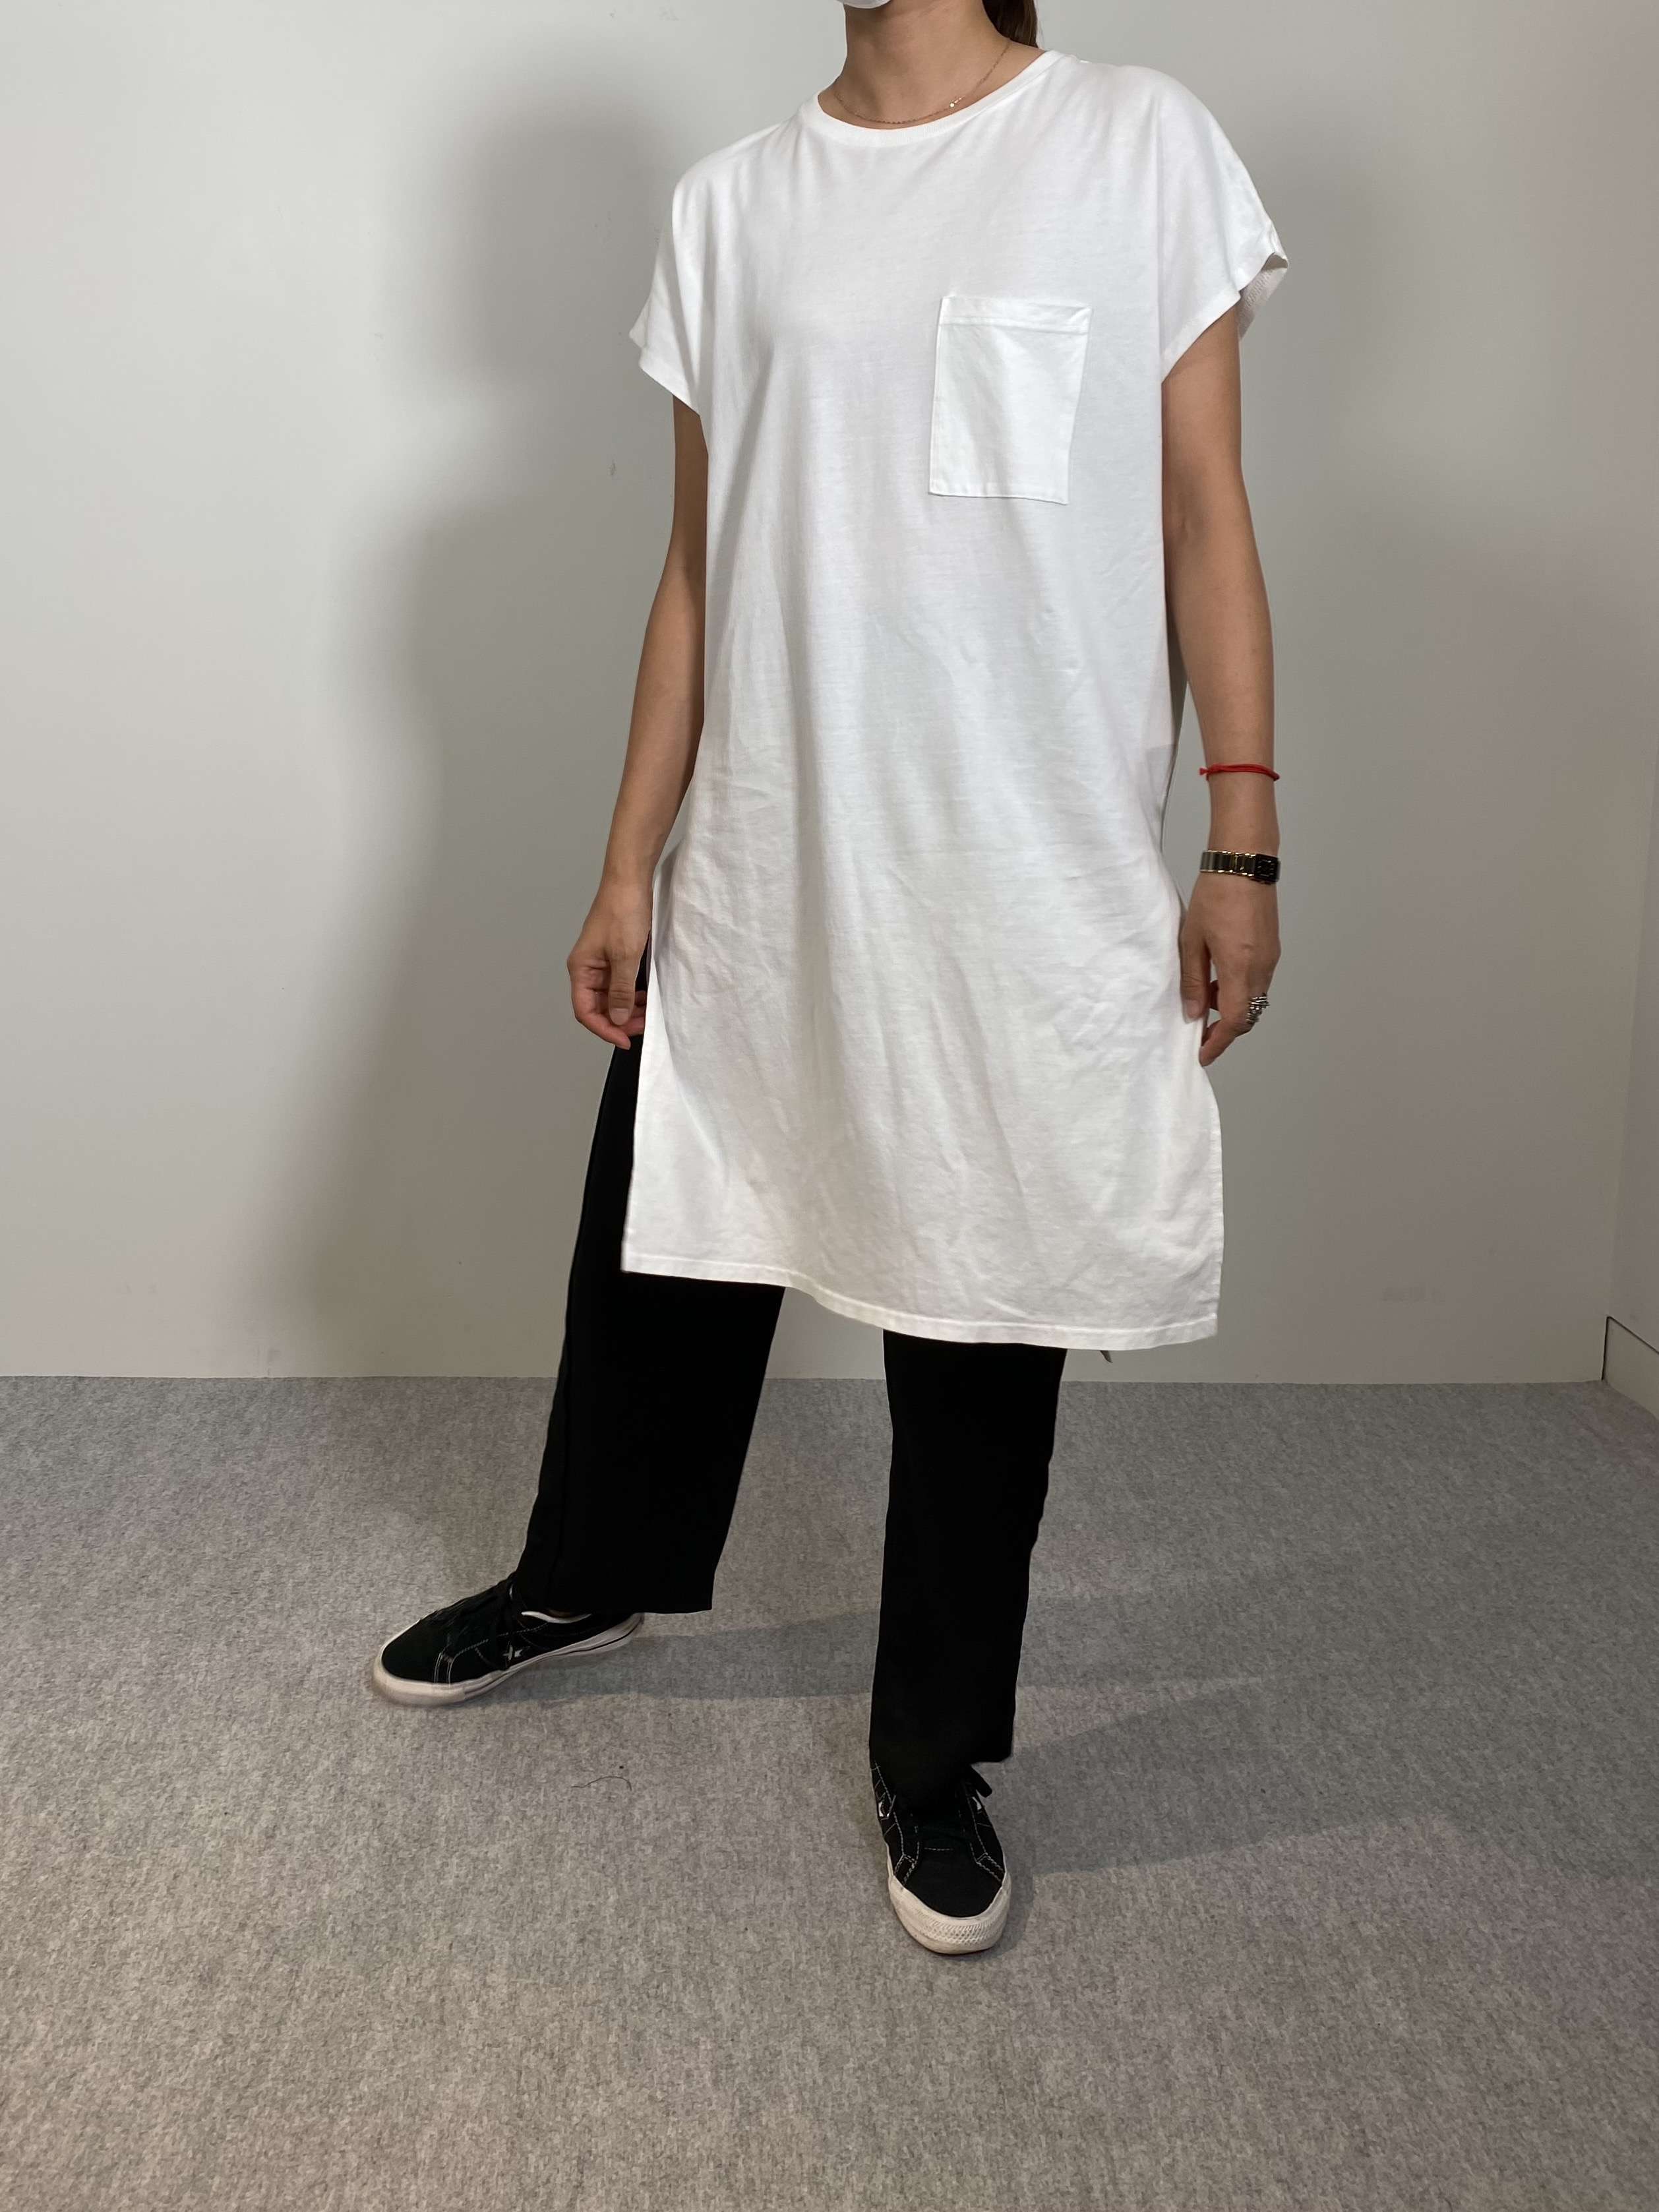 Women's COMFORT DRESS TUNIC T-SHIRTの着用画像8